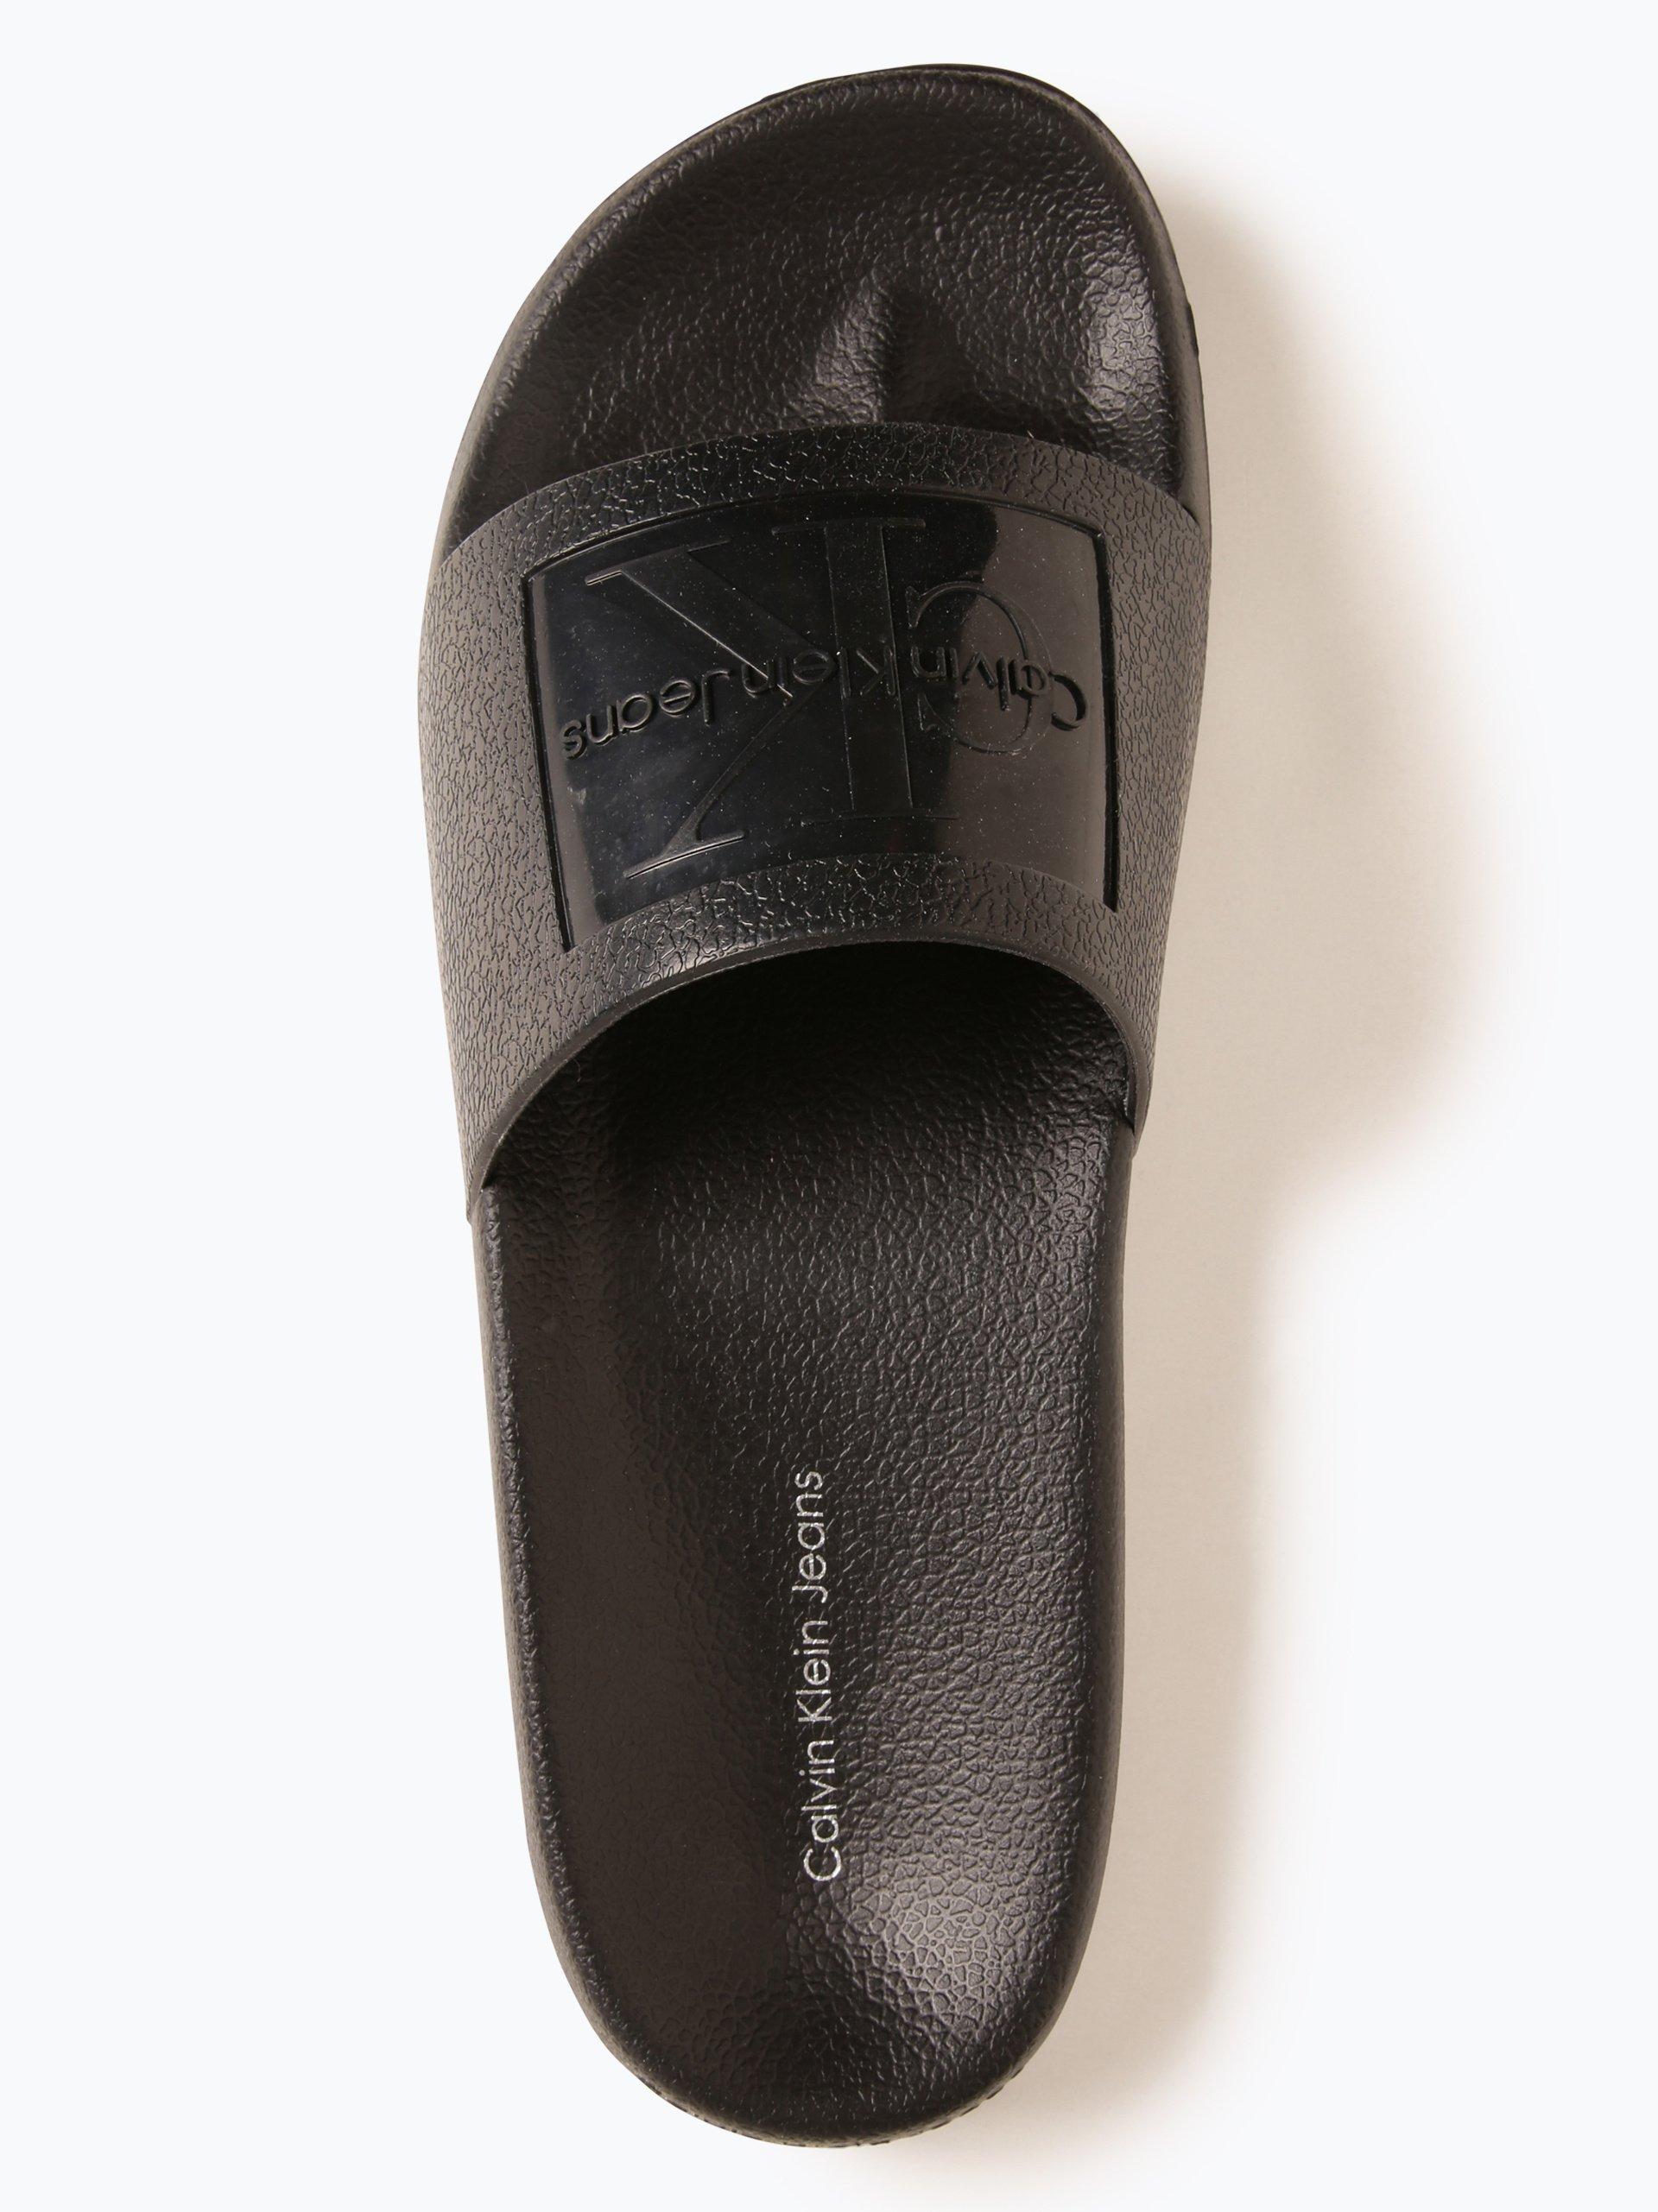 calvin klein jeans damen sandalen schwarz uni online. Black Bedroom Furniture Sets. Home Design Ideas